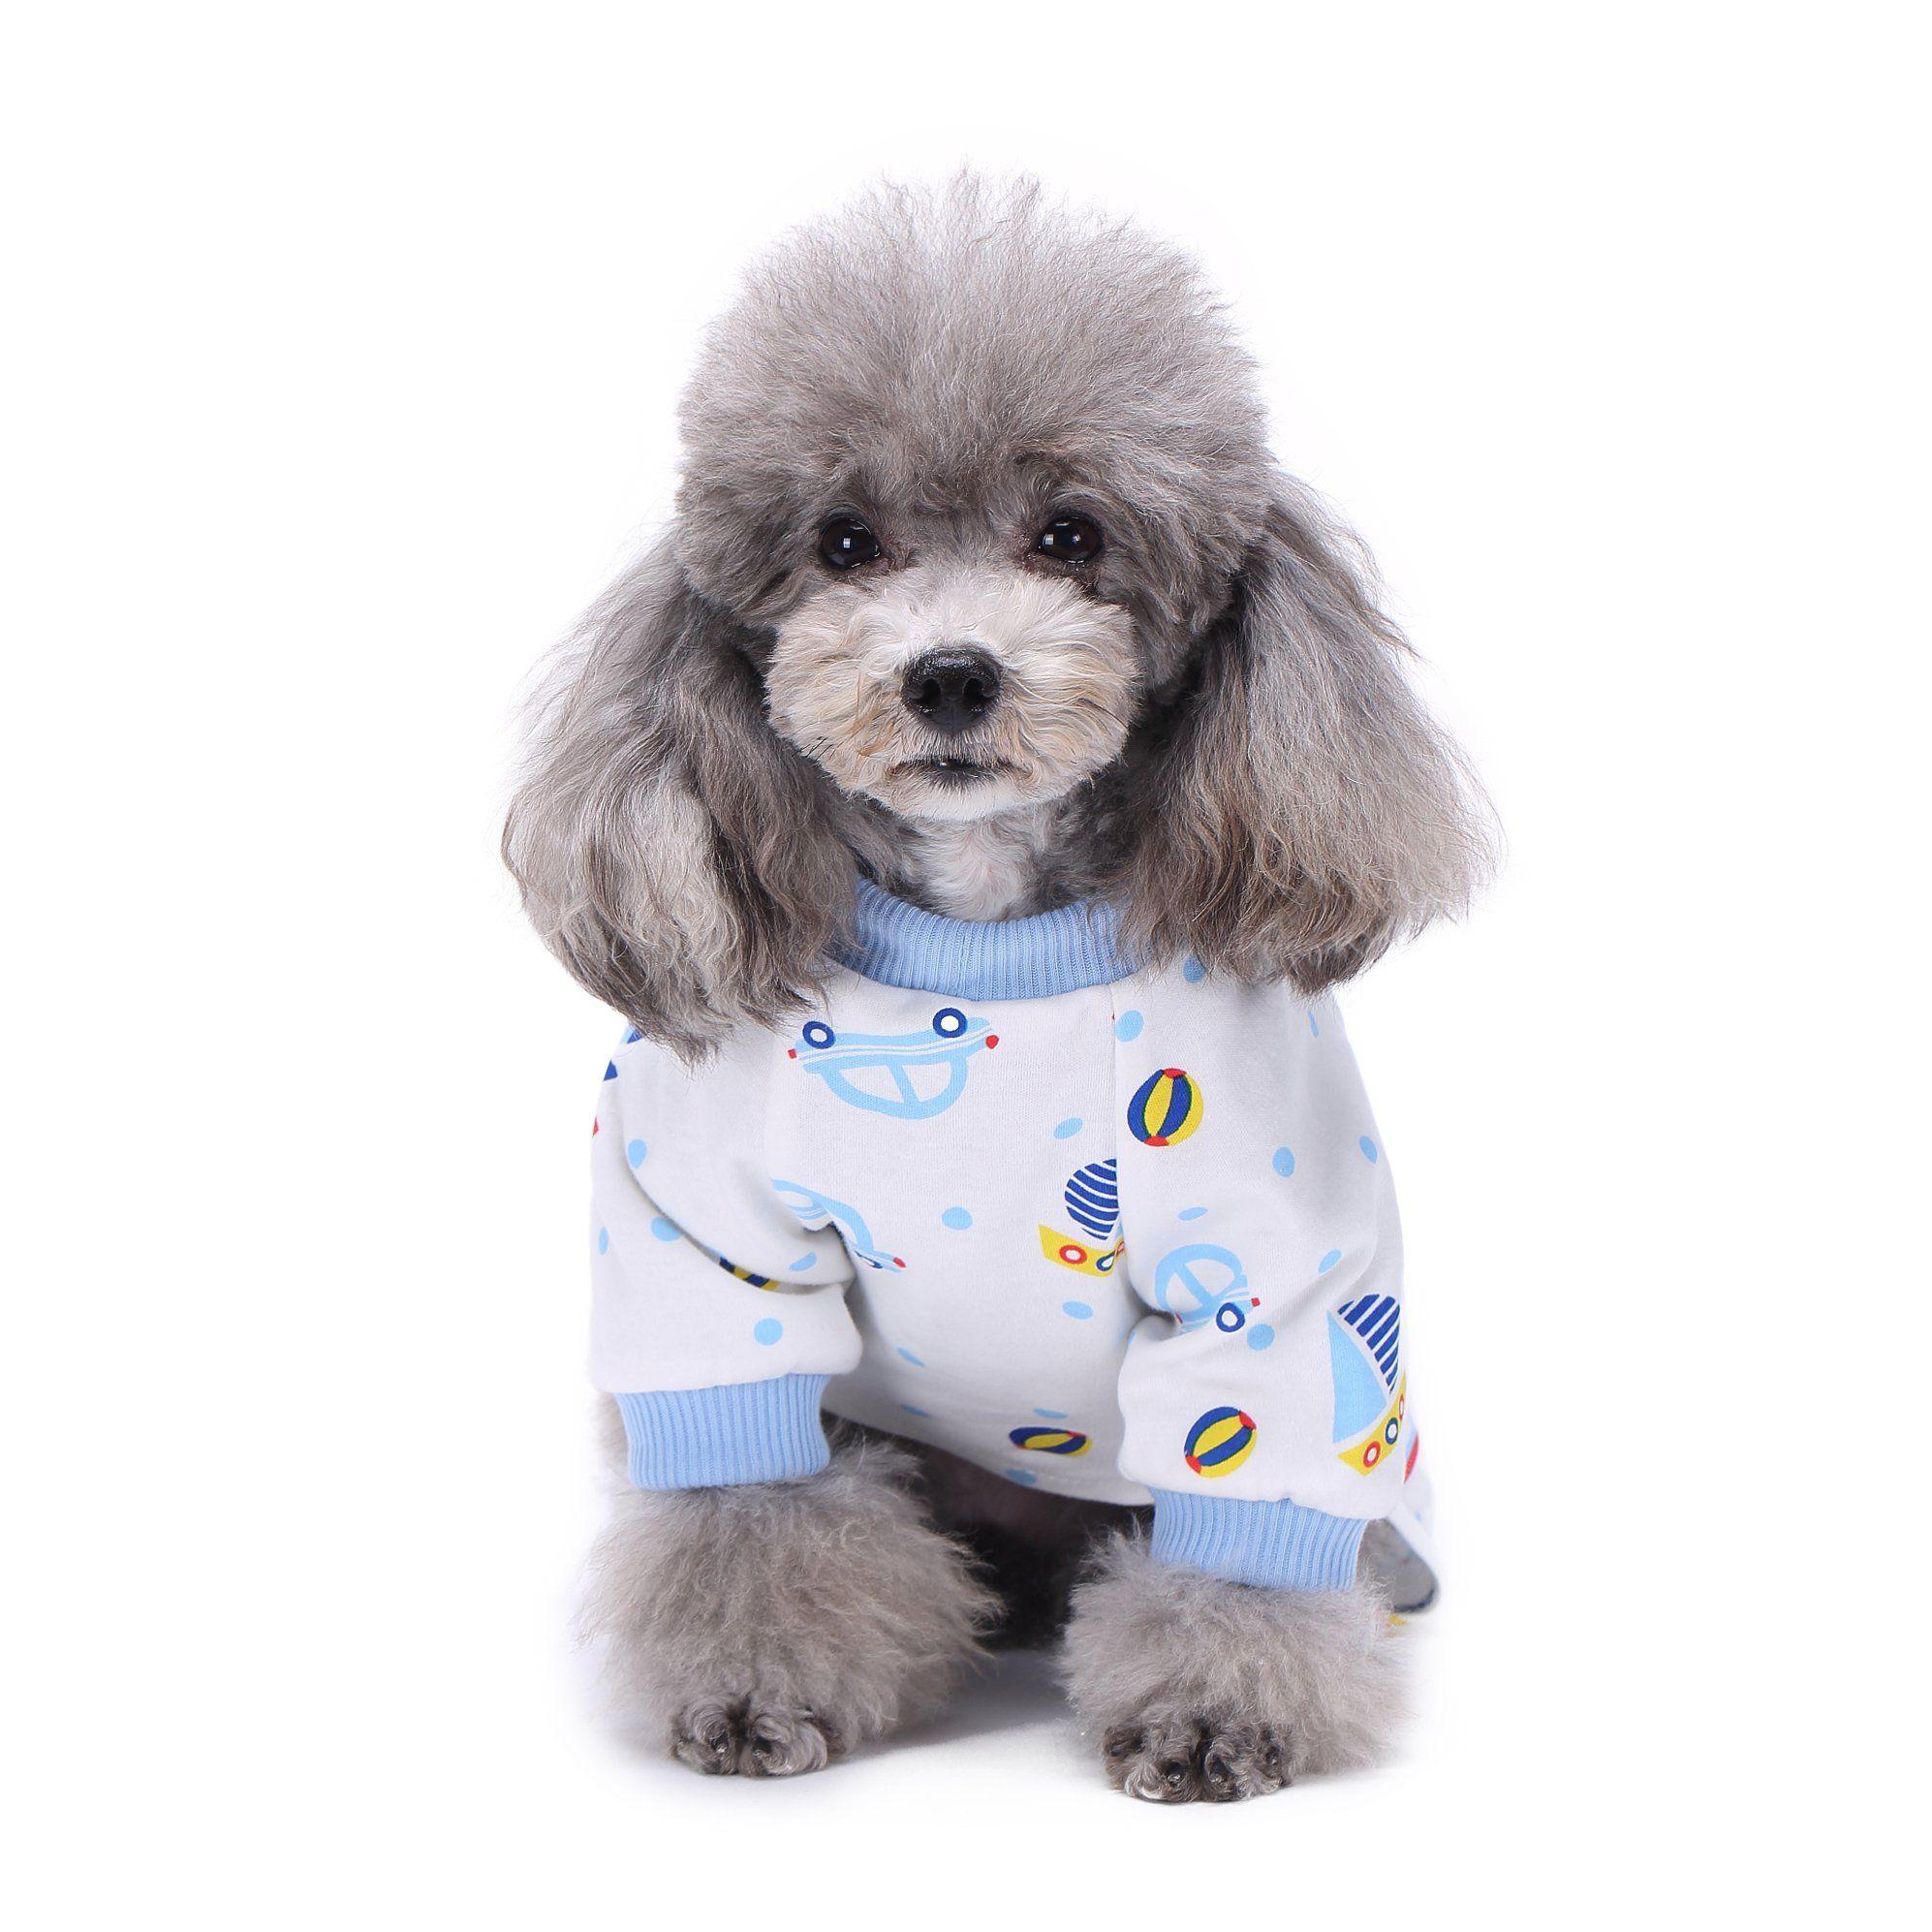 Bondogland Cute Car Dog Clothes For Small Dogs Puppy Cotton